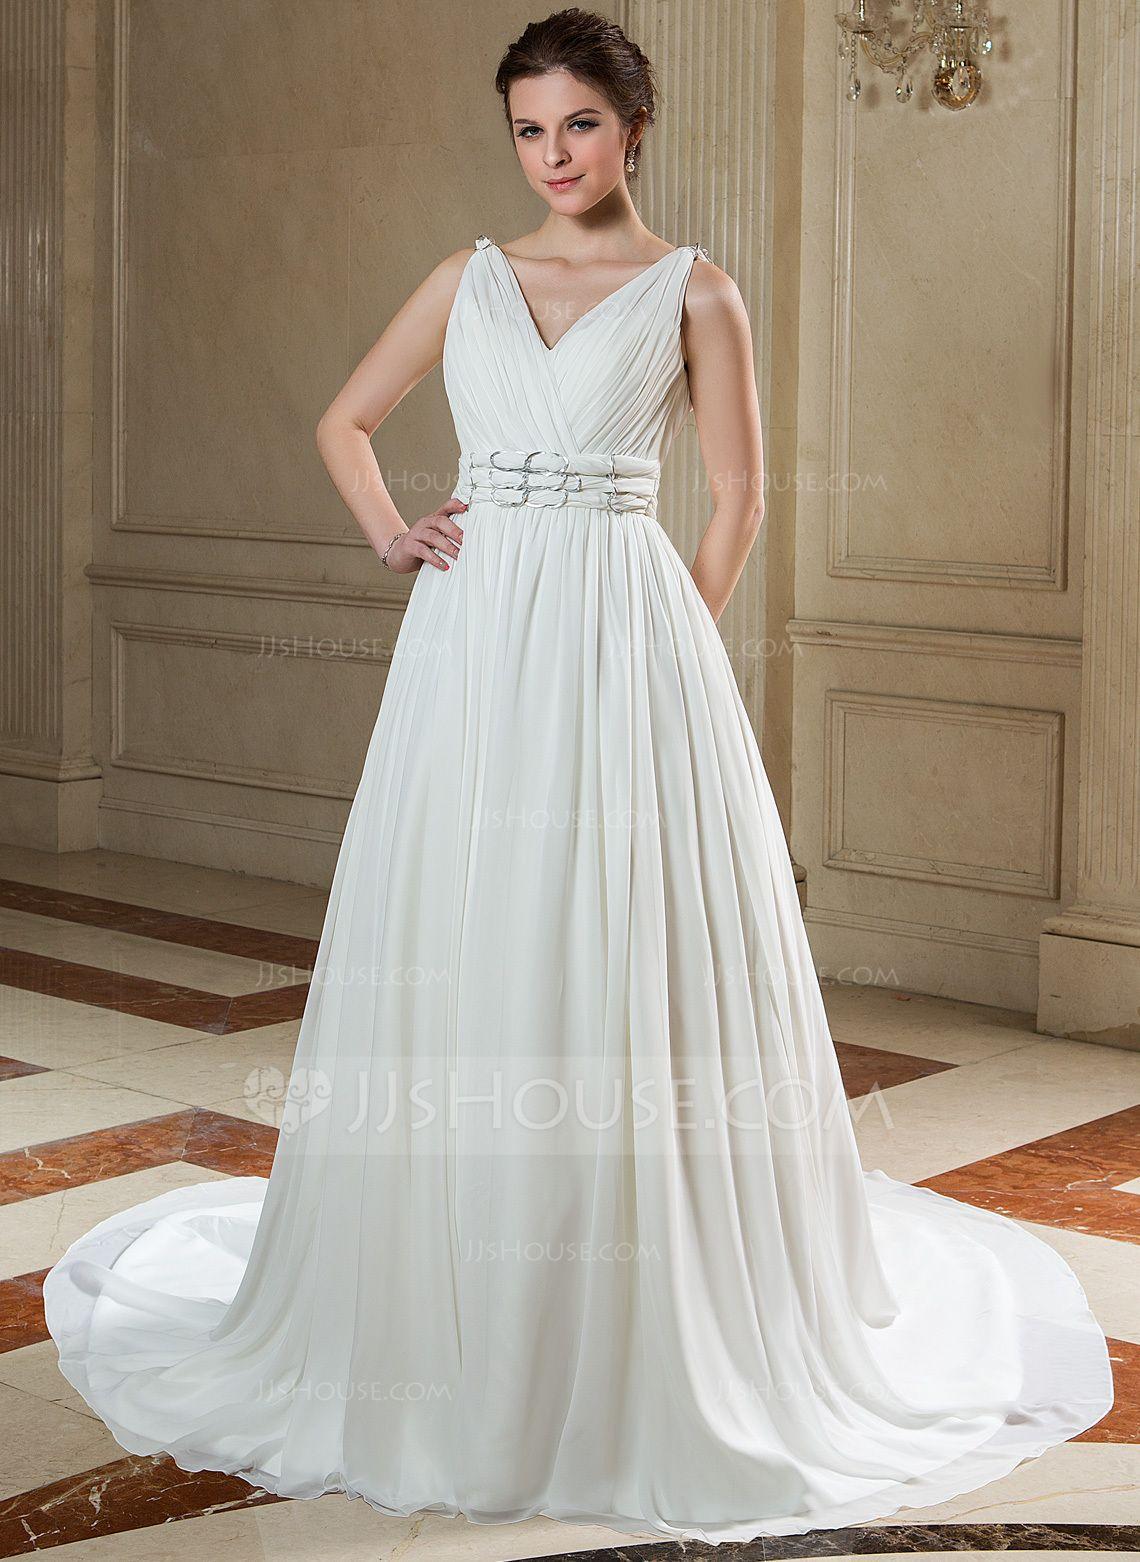 Ivory beach wedding dresses  ALinePrincess Vneck Chapel Train Ruffle Beading Zipper Up Regular